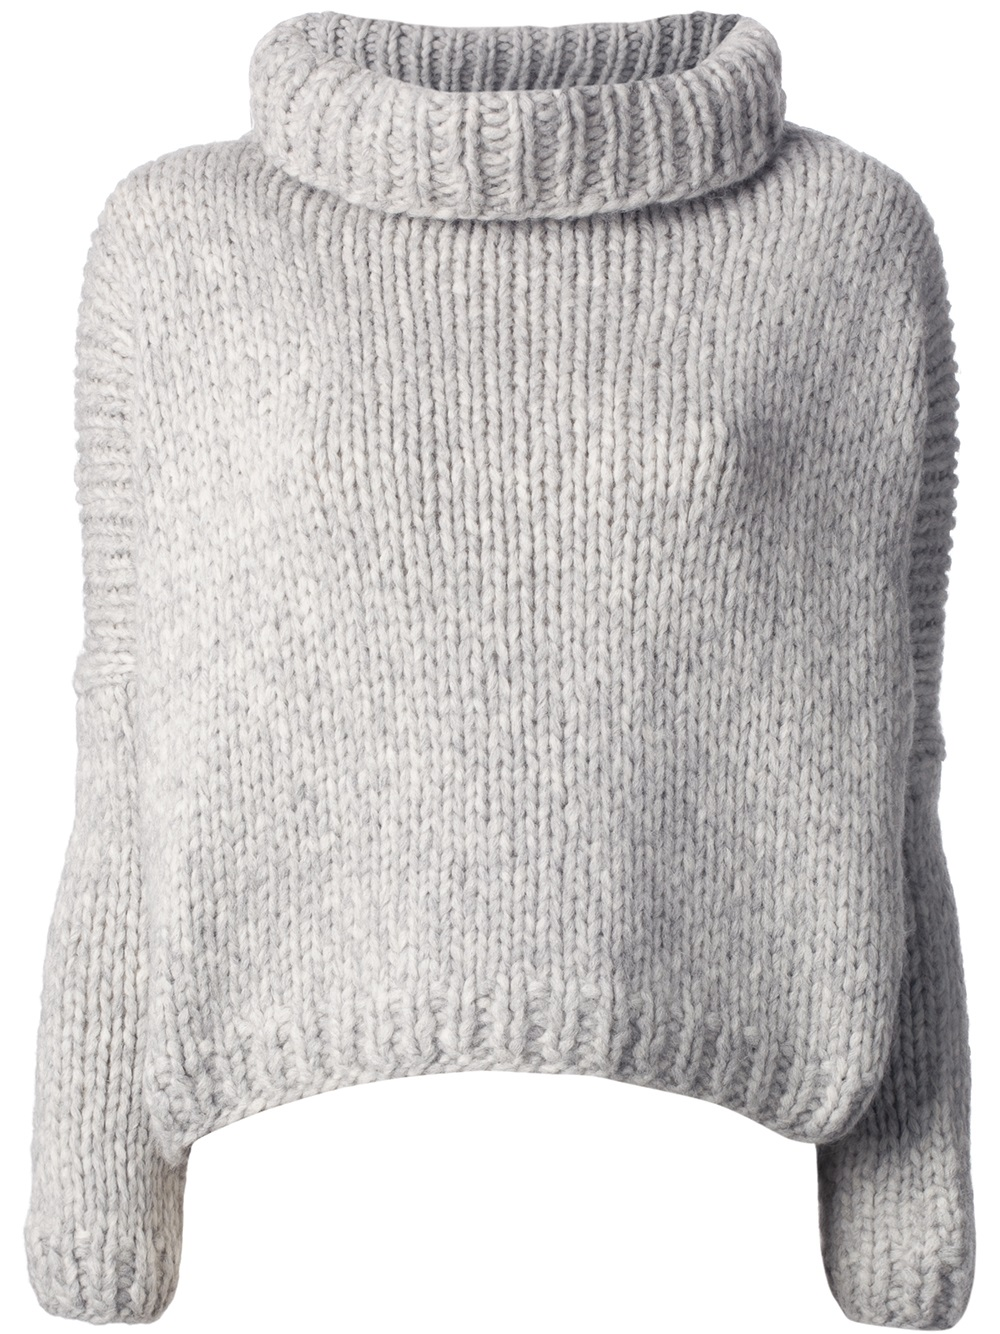 Lyst - Jo no fui Chunky Knit Sweater in Gray